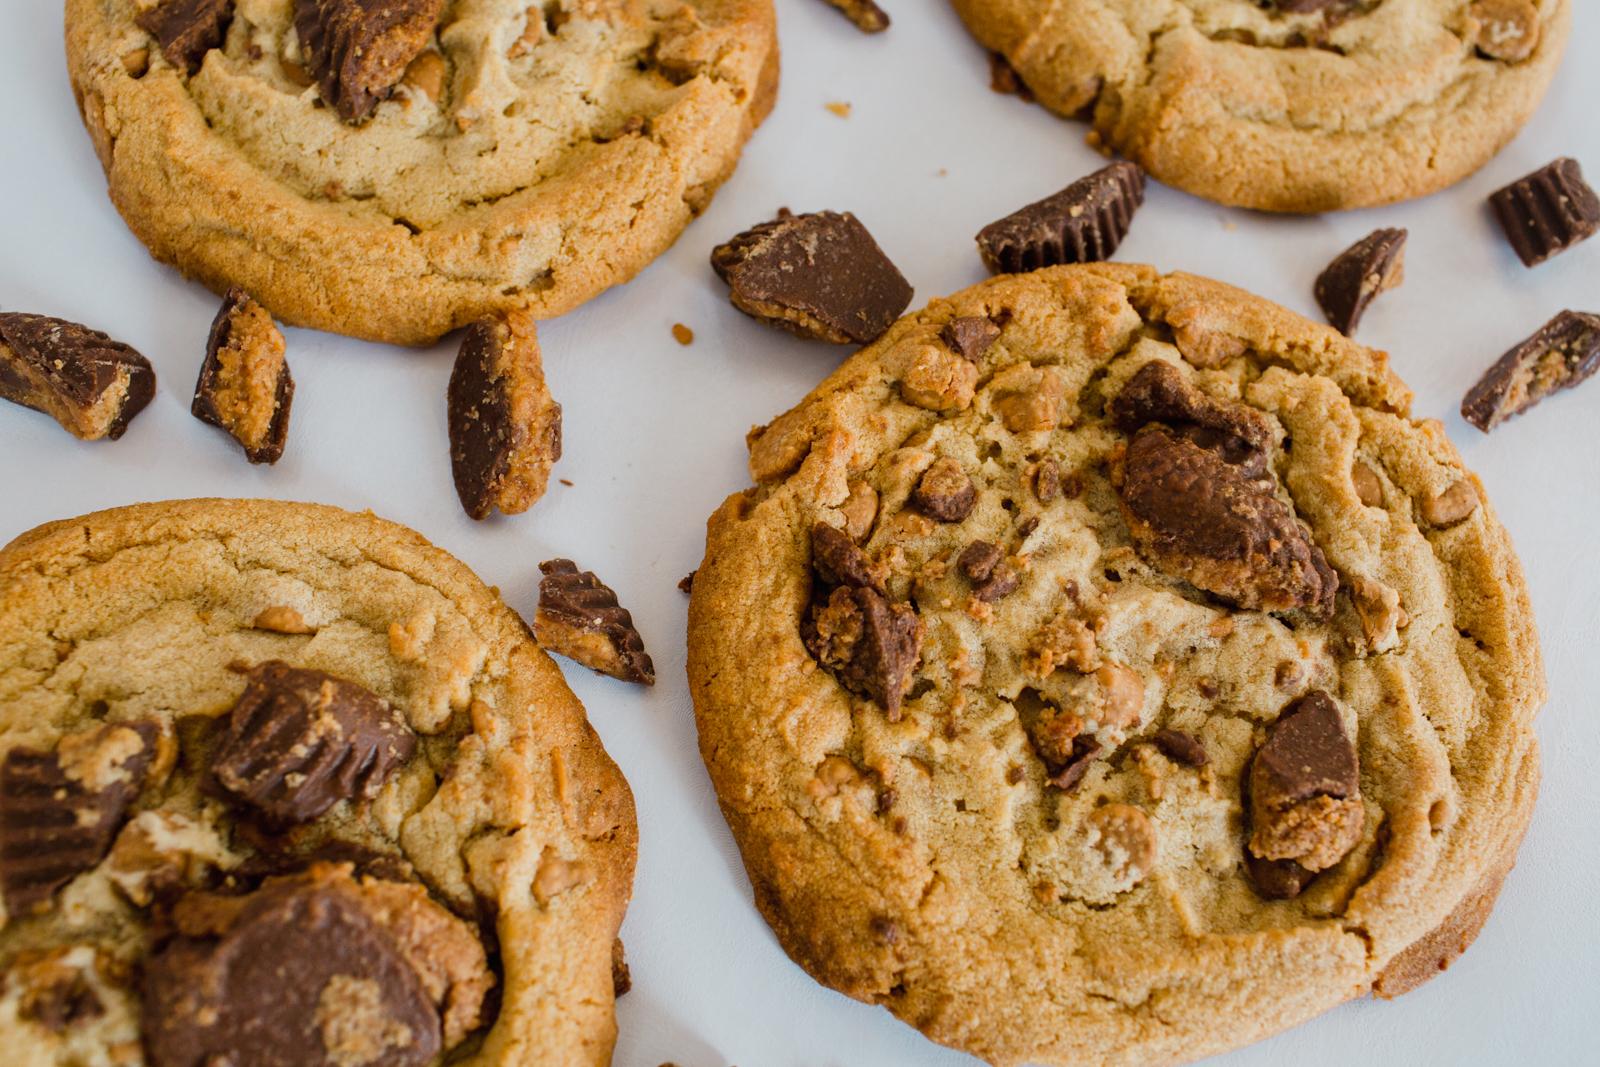 OMG Peanut Butter Cookie